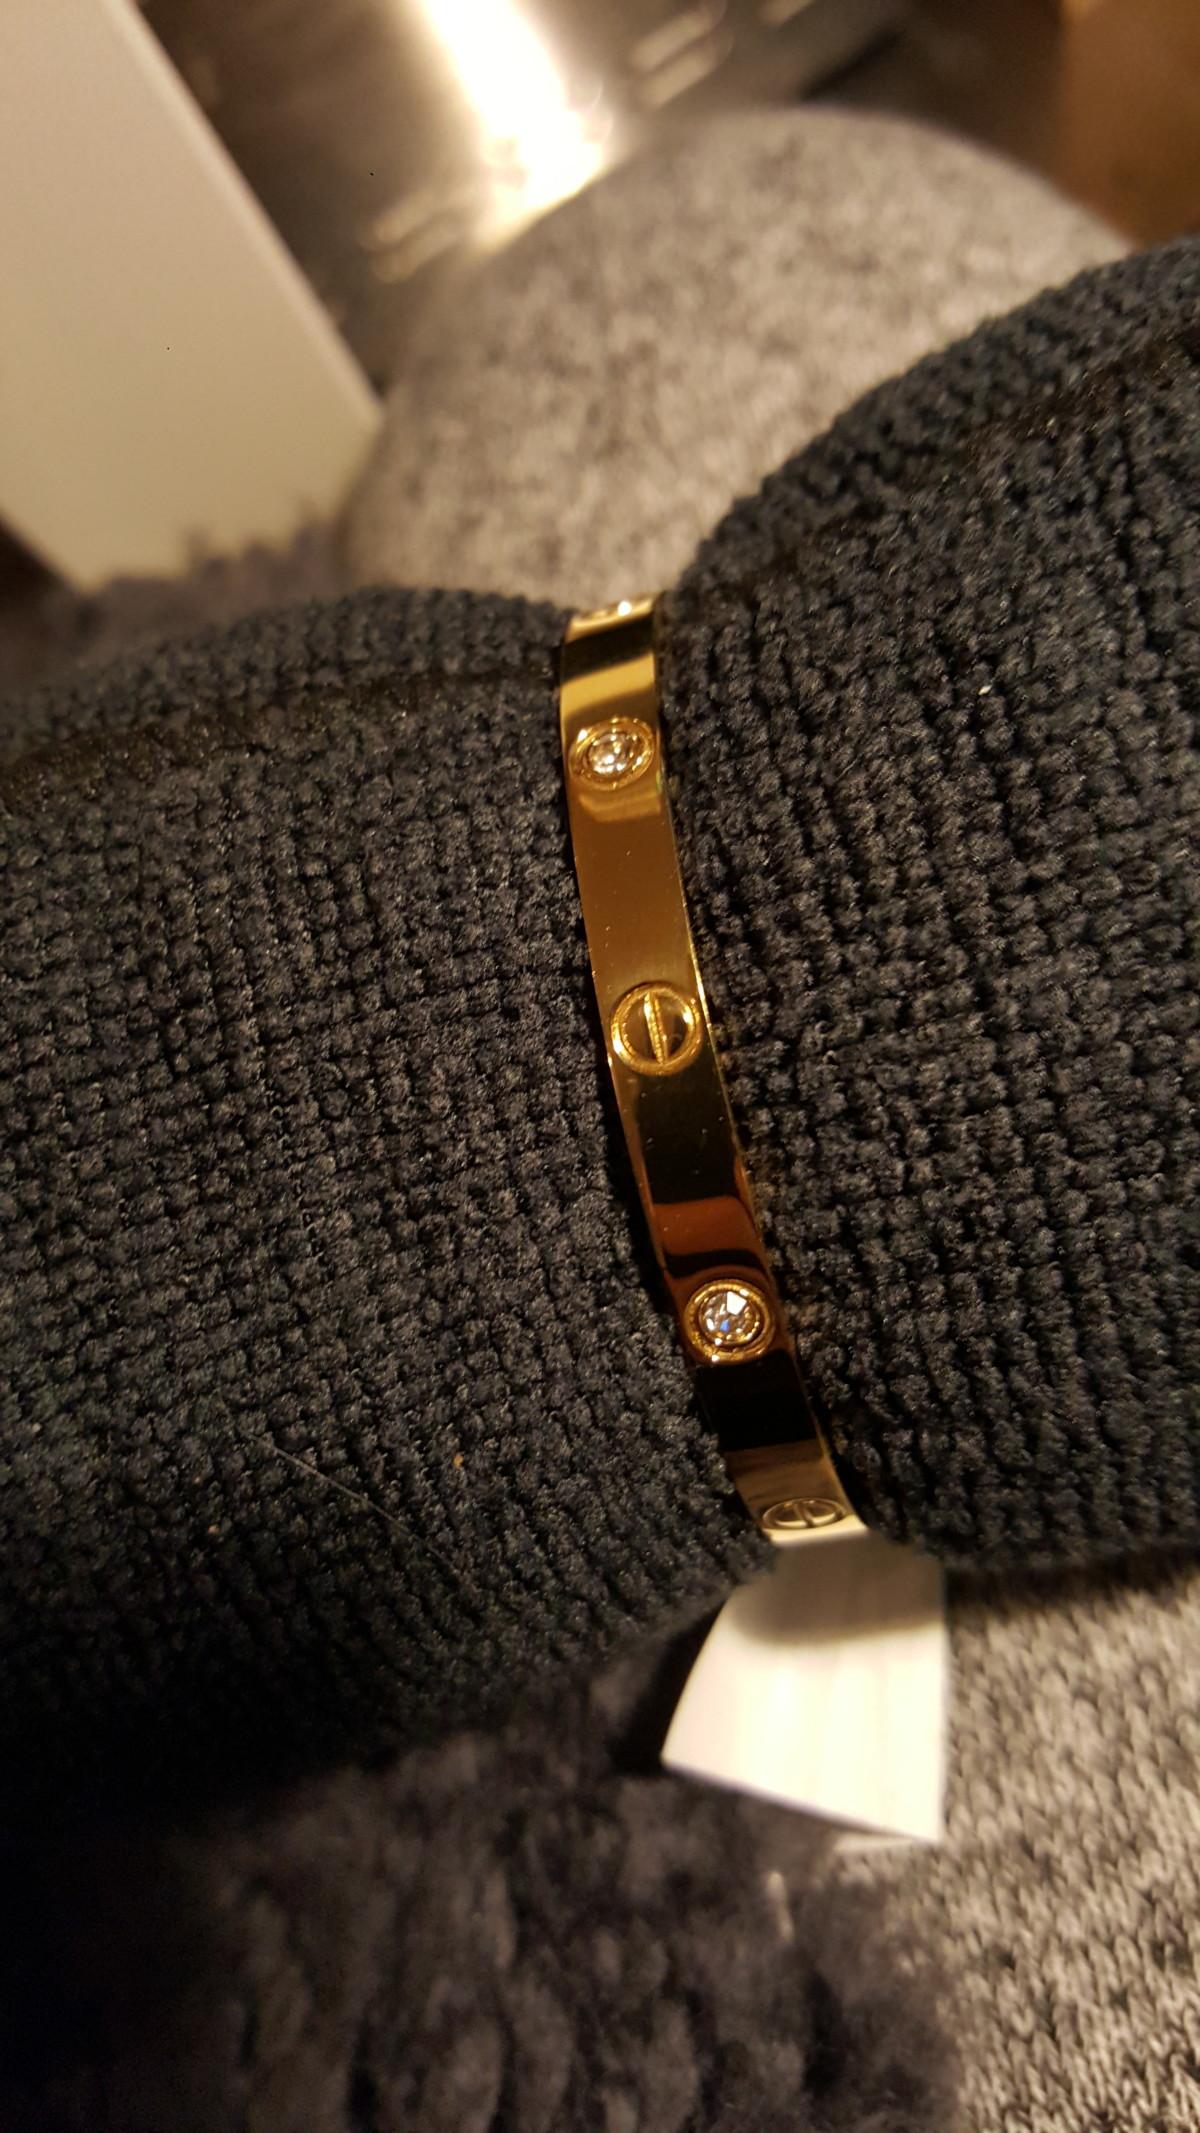 cartier-bracelet-bangles-love-lovebracelet-diamonds-crystal-crystals-diamond-diamondstyle-london-gold-rosegold-pinkgold-lovebangle-members-gull-armbånd-diamant-krystall-isalicious-blogger-blogg-smykker-